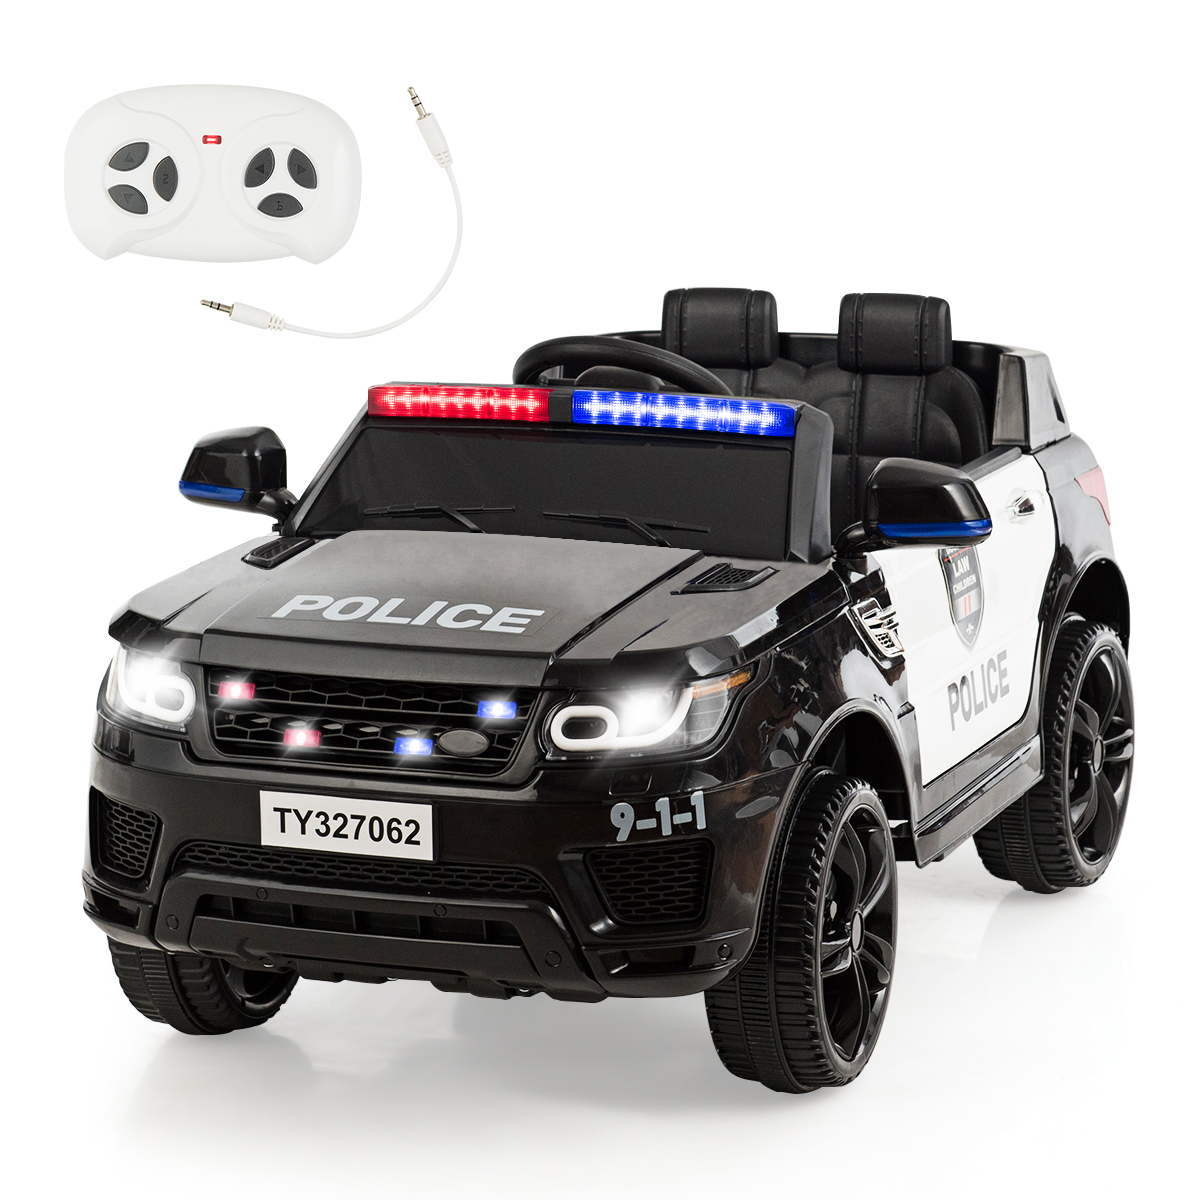 Kids 12V Electric Ride On Car W/Remote Control Bluetooth Lights/Sounds Black